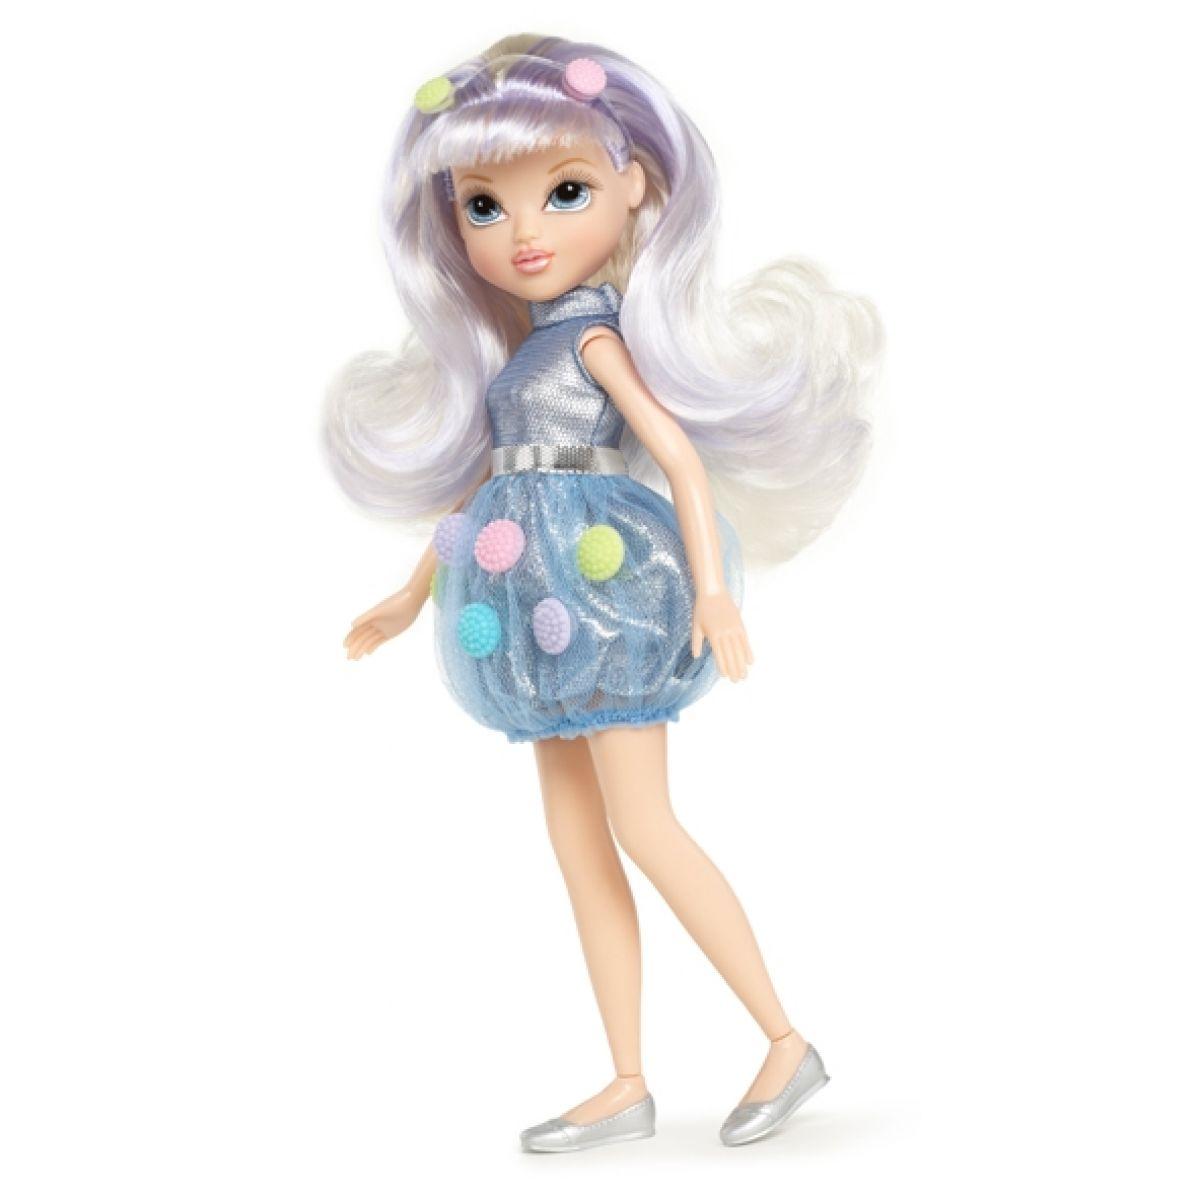 Moxie Girlz Panenka s nacvakávacími ozdobami - Avery